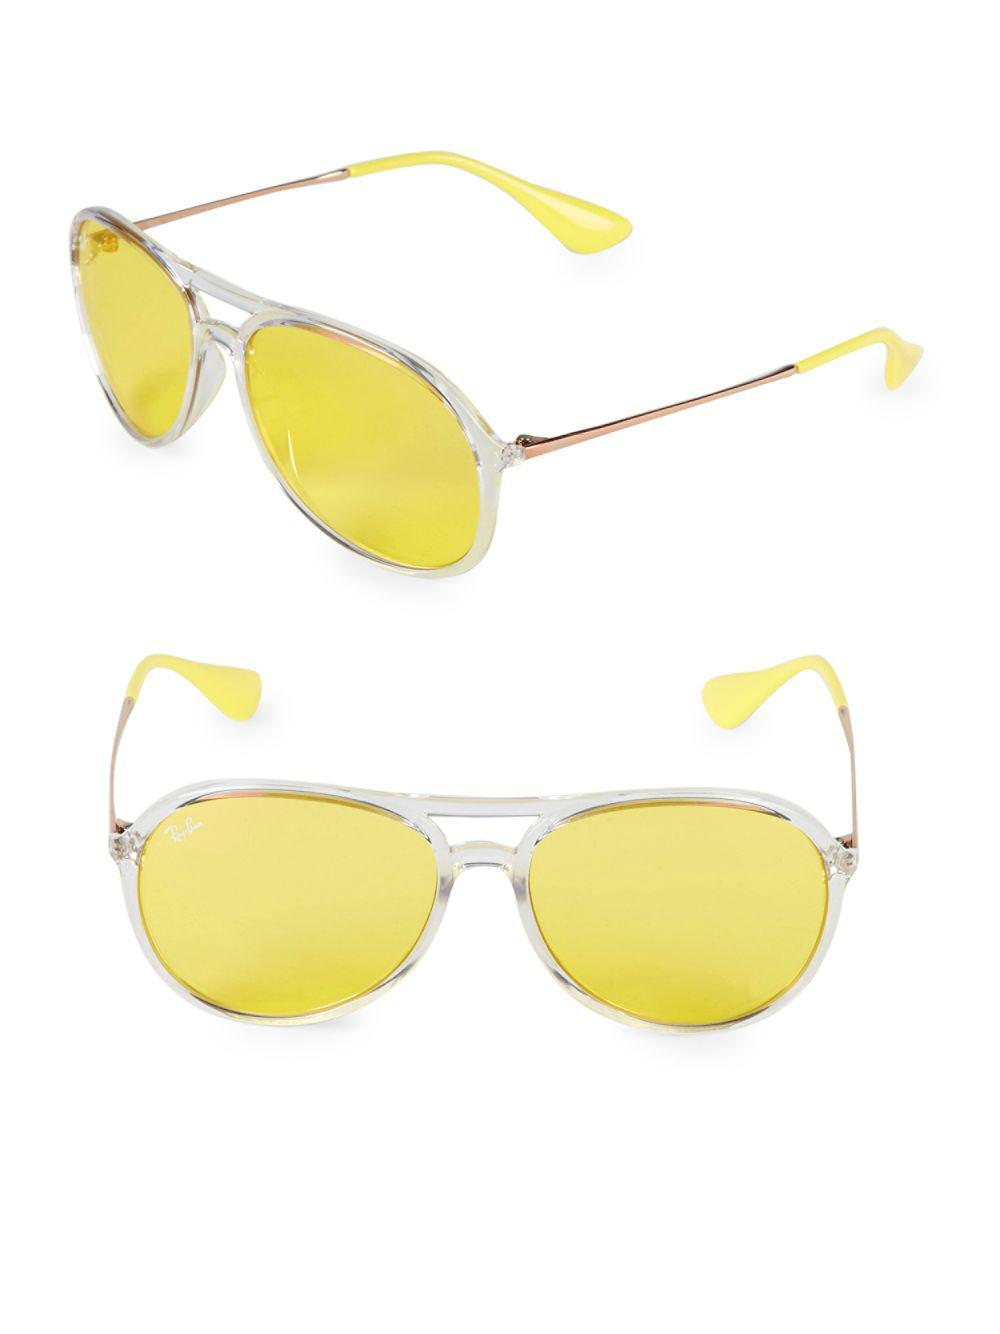 1440eaf02f Lyst - Ray-Ban 59mm Alex Pilot Sunglasses in Yellow